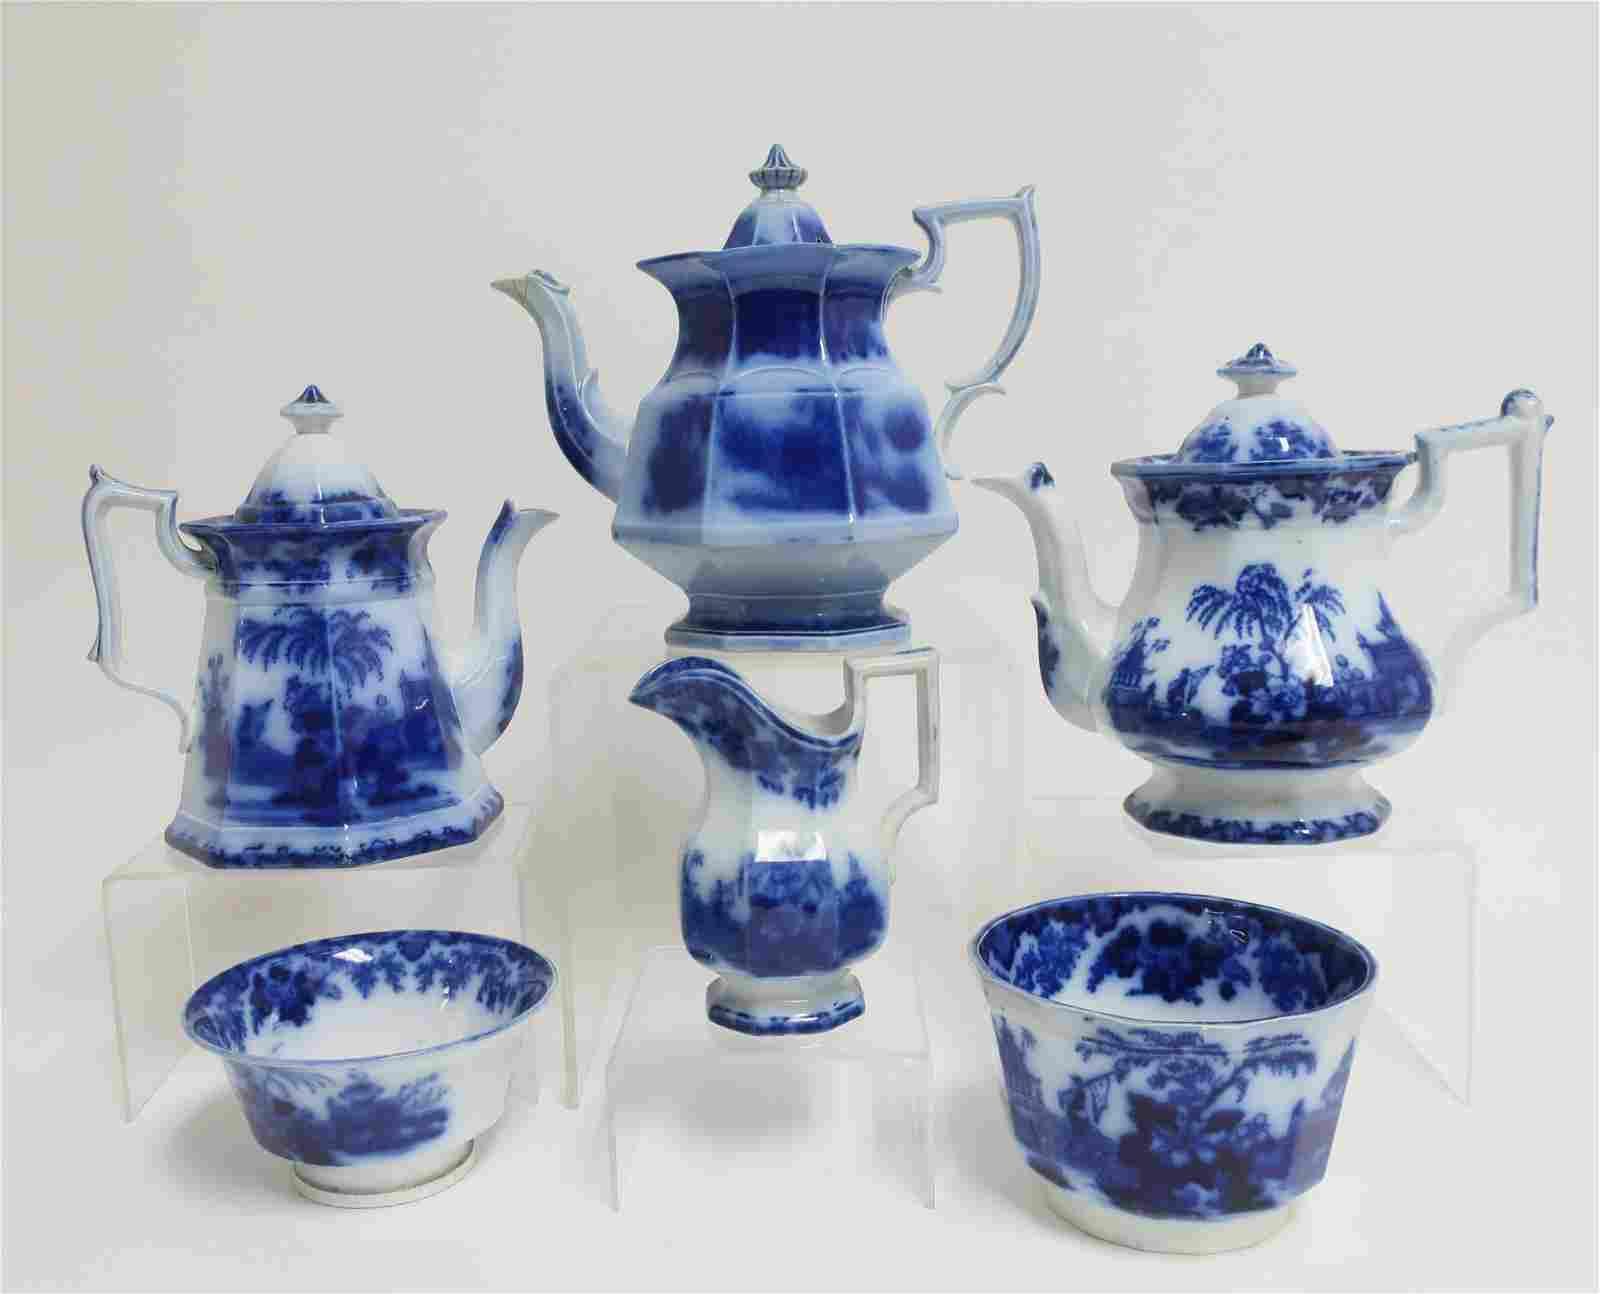 6 Flow Blue 'Scinde' Transferware Teawares, 19th C